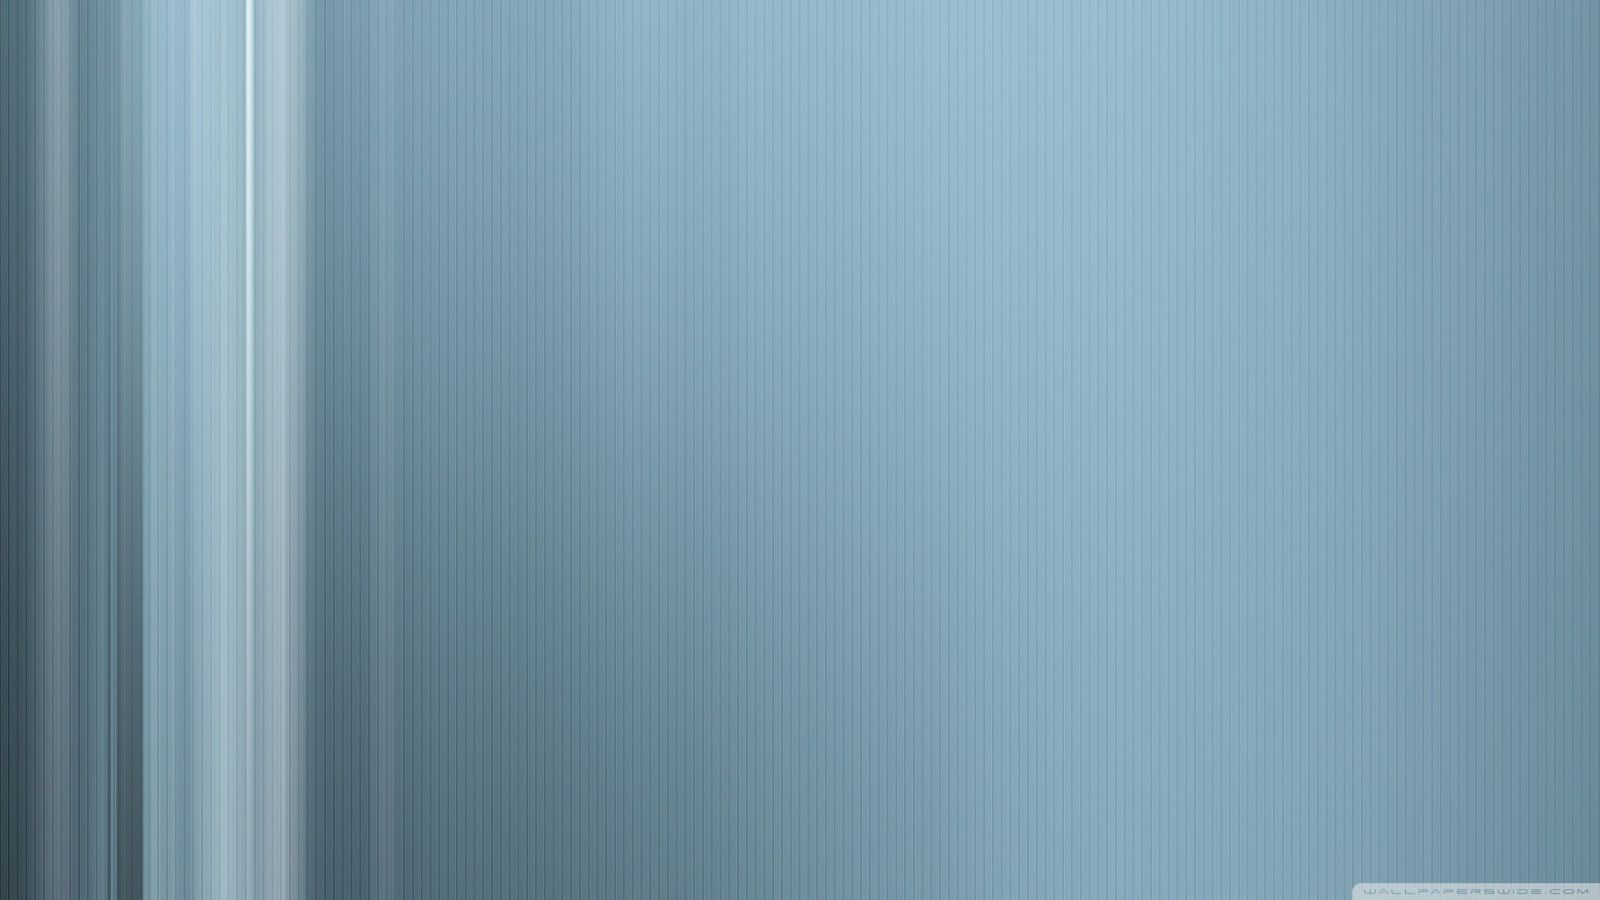 190 Vertical Wallpaper Hd: 4K 16 9 Vertical Wallpapers